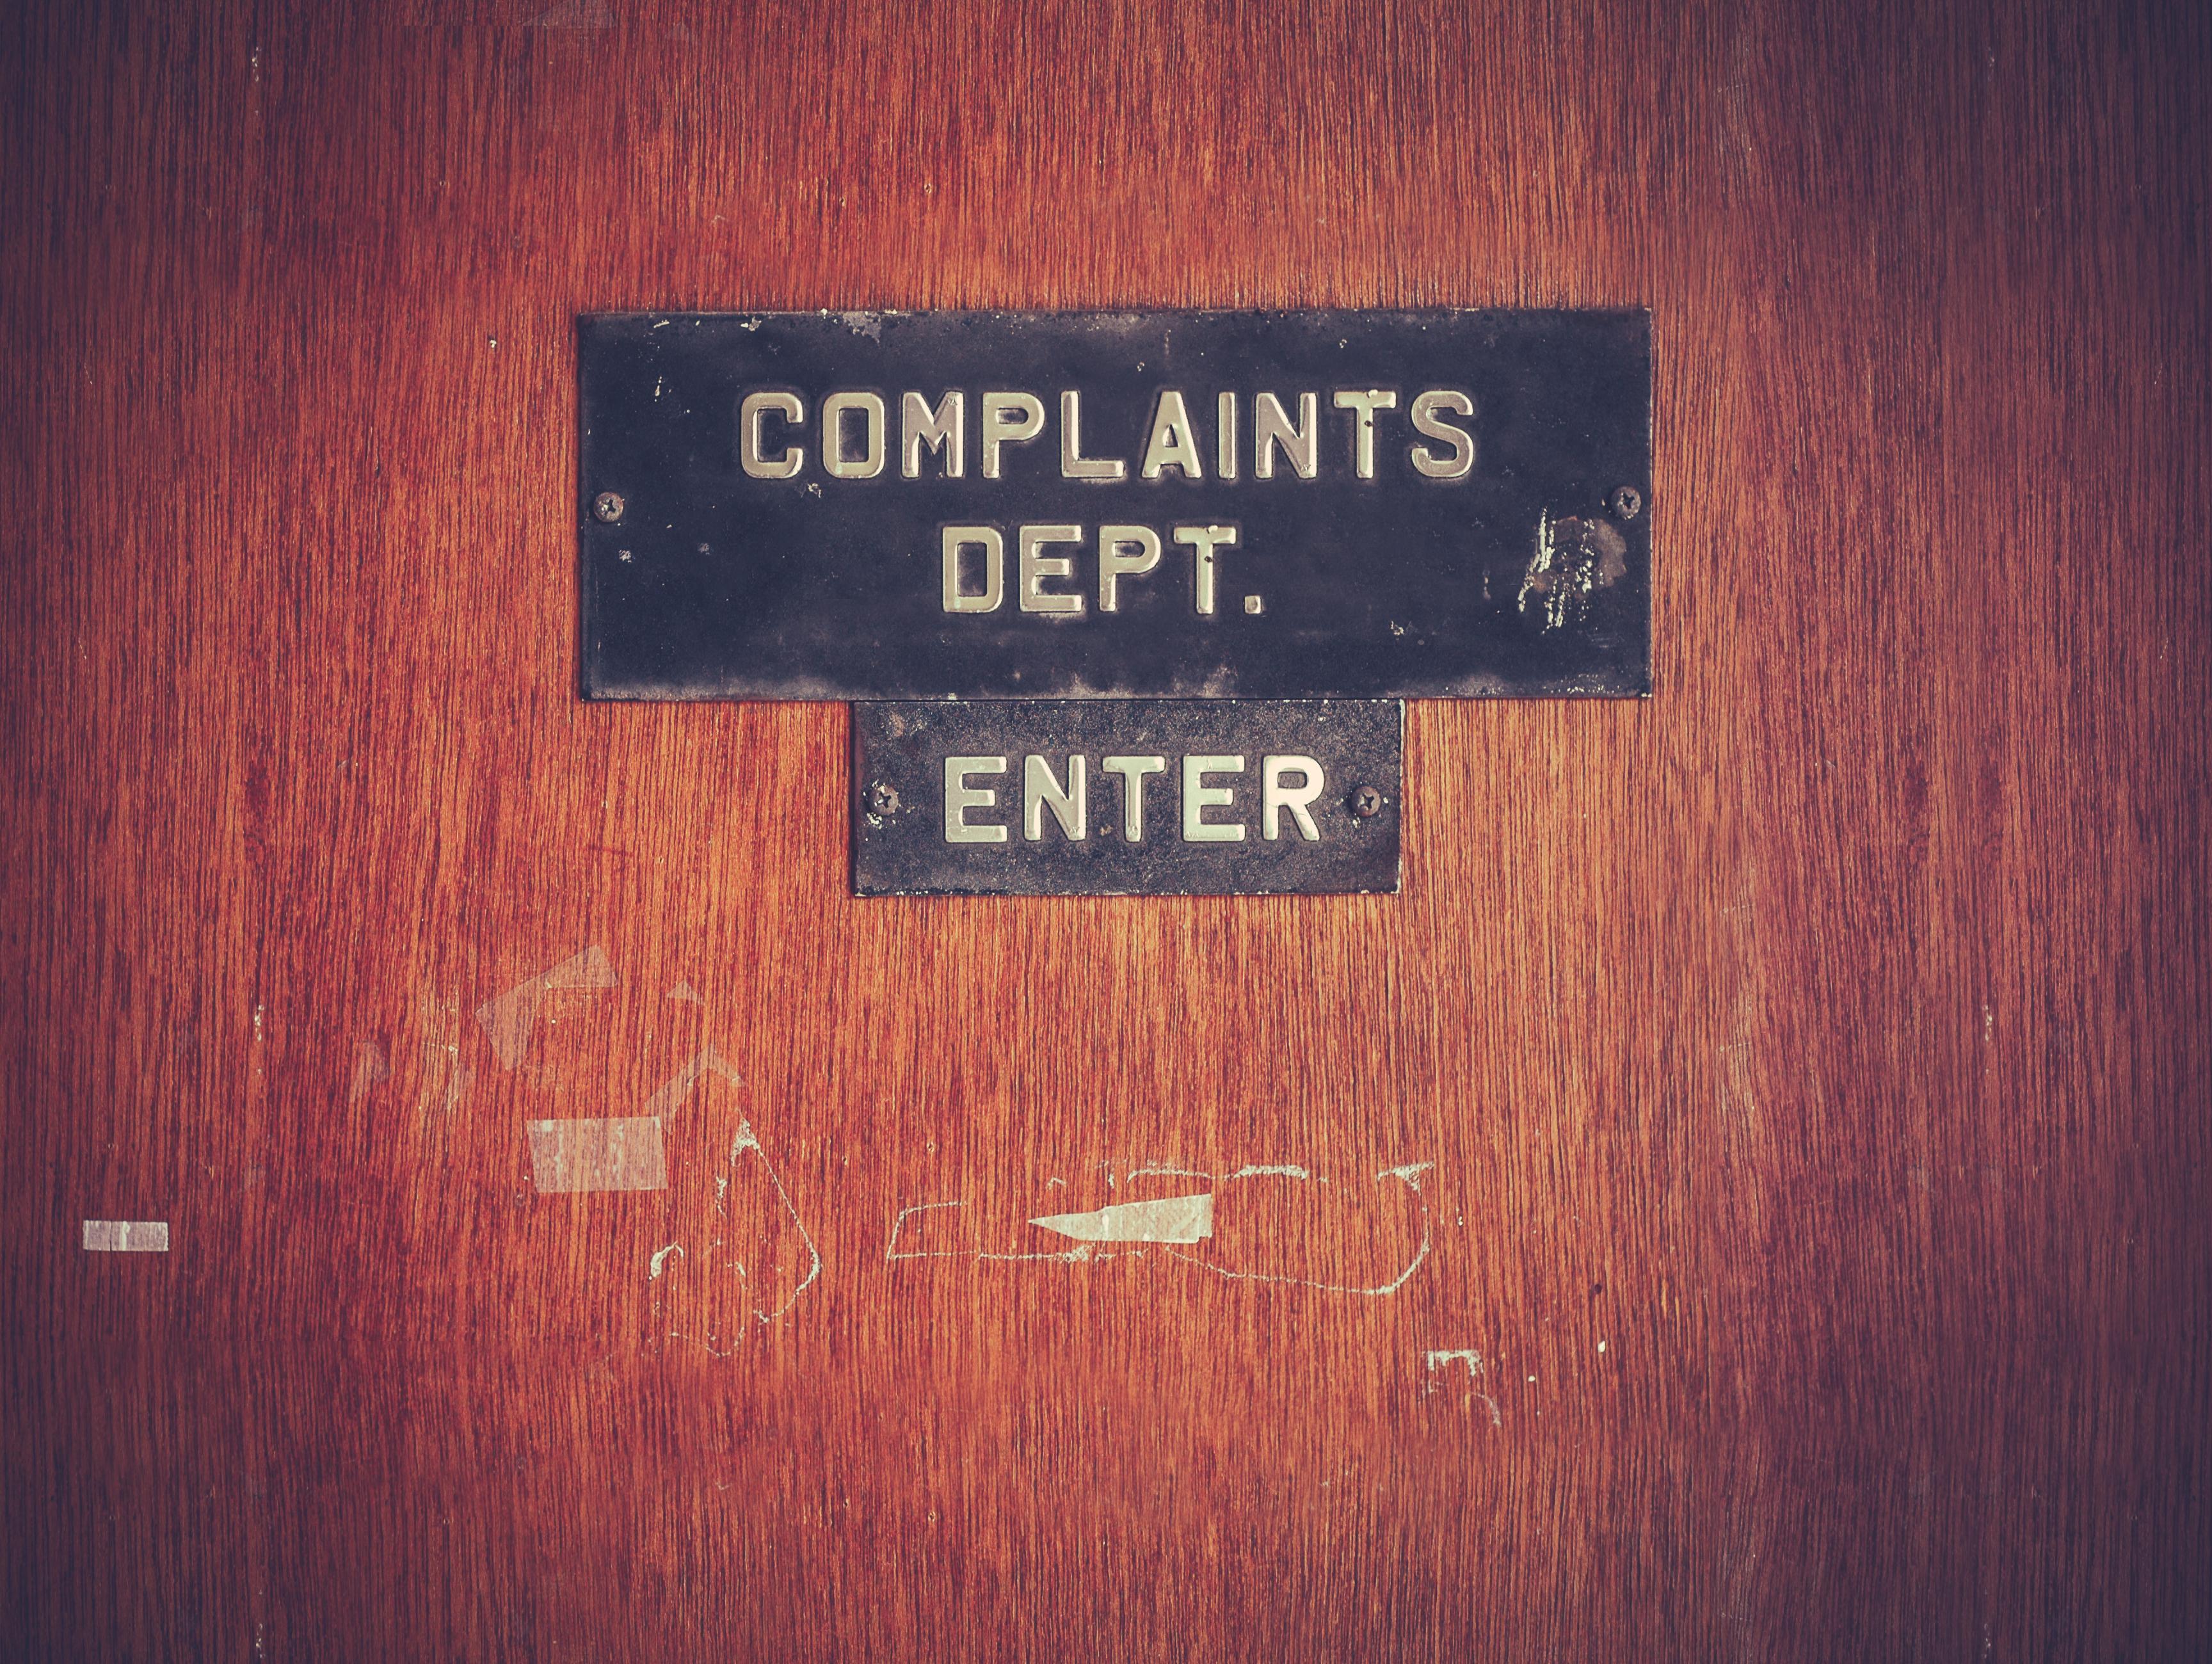 Door with complaints dept. lettering on it.